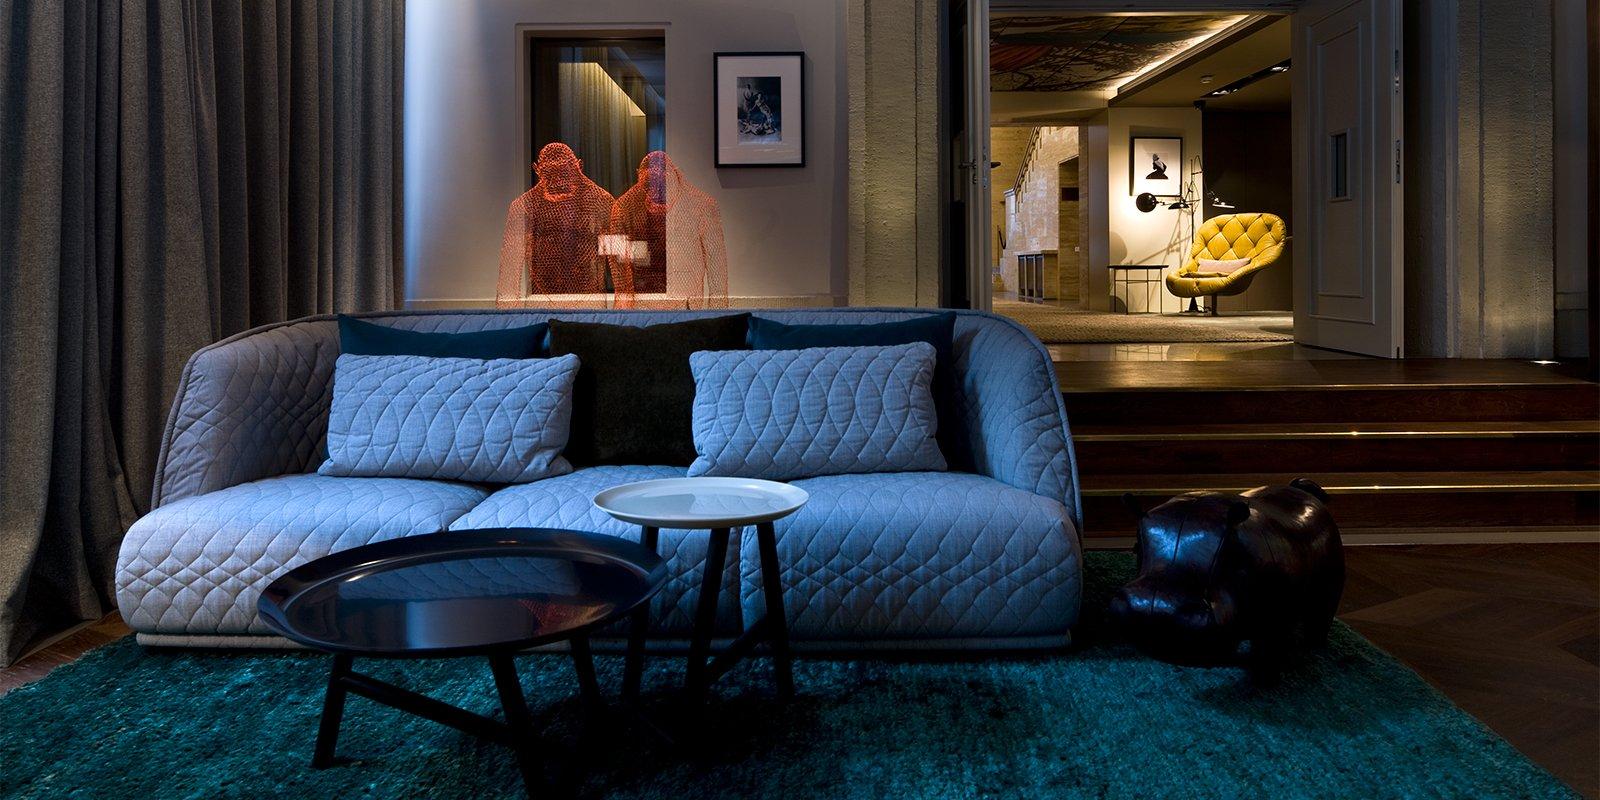 Italiaans design, Italiaans furniture, meubels,